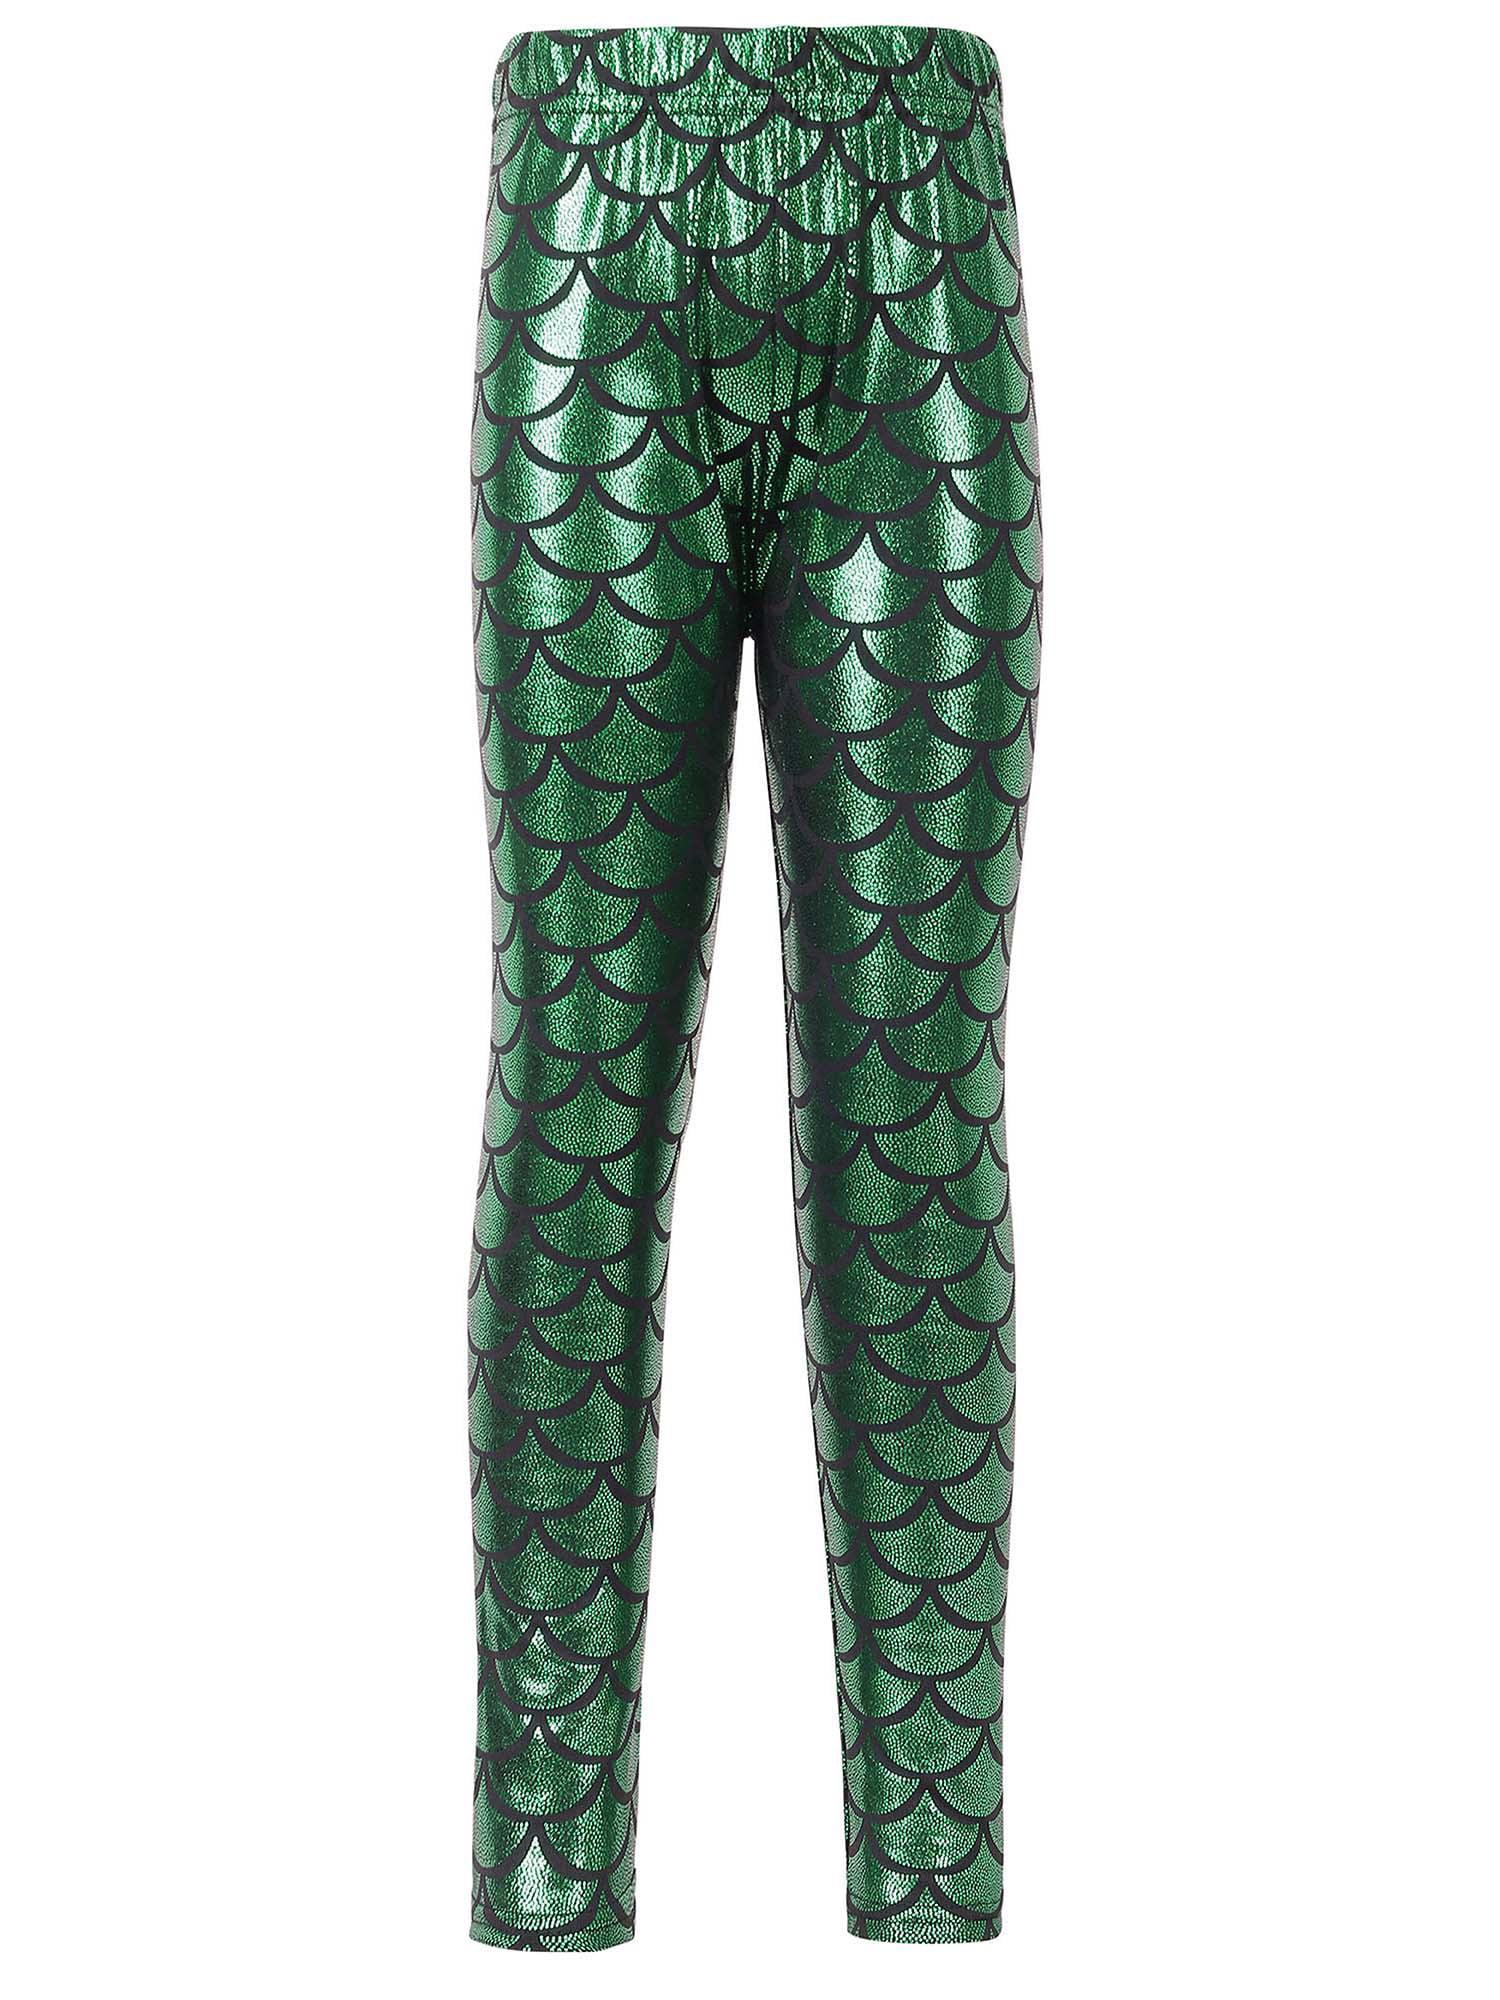 Simplicity Kids Mermaid Fish Scale Print Full Length Leggings Pants, Green, XL